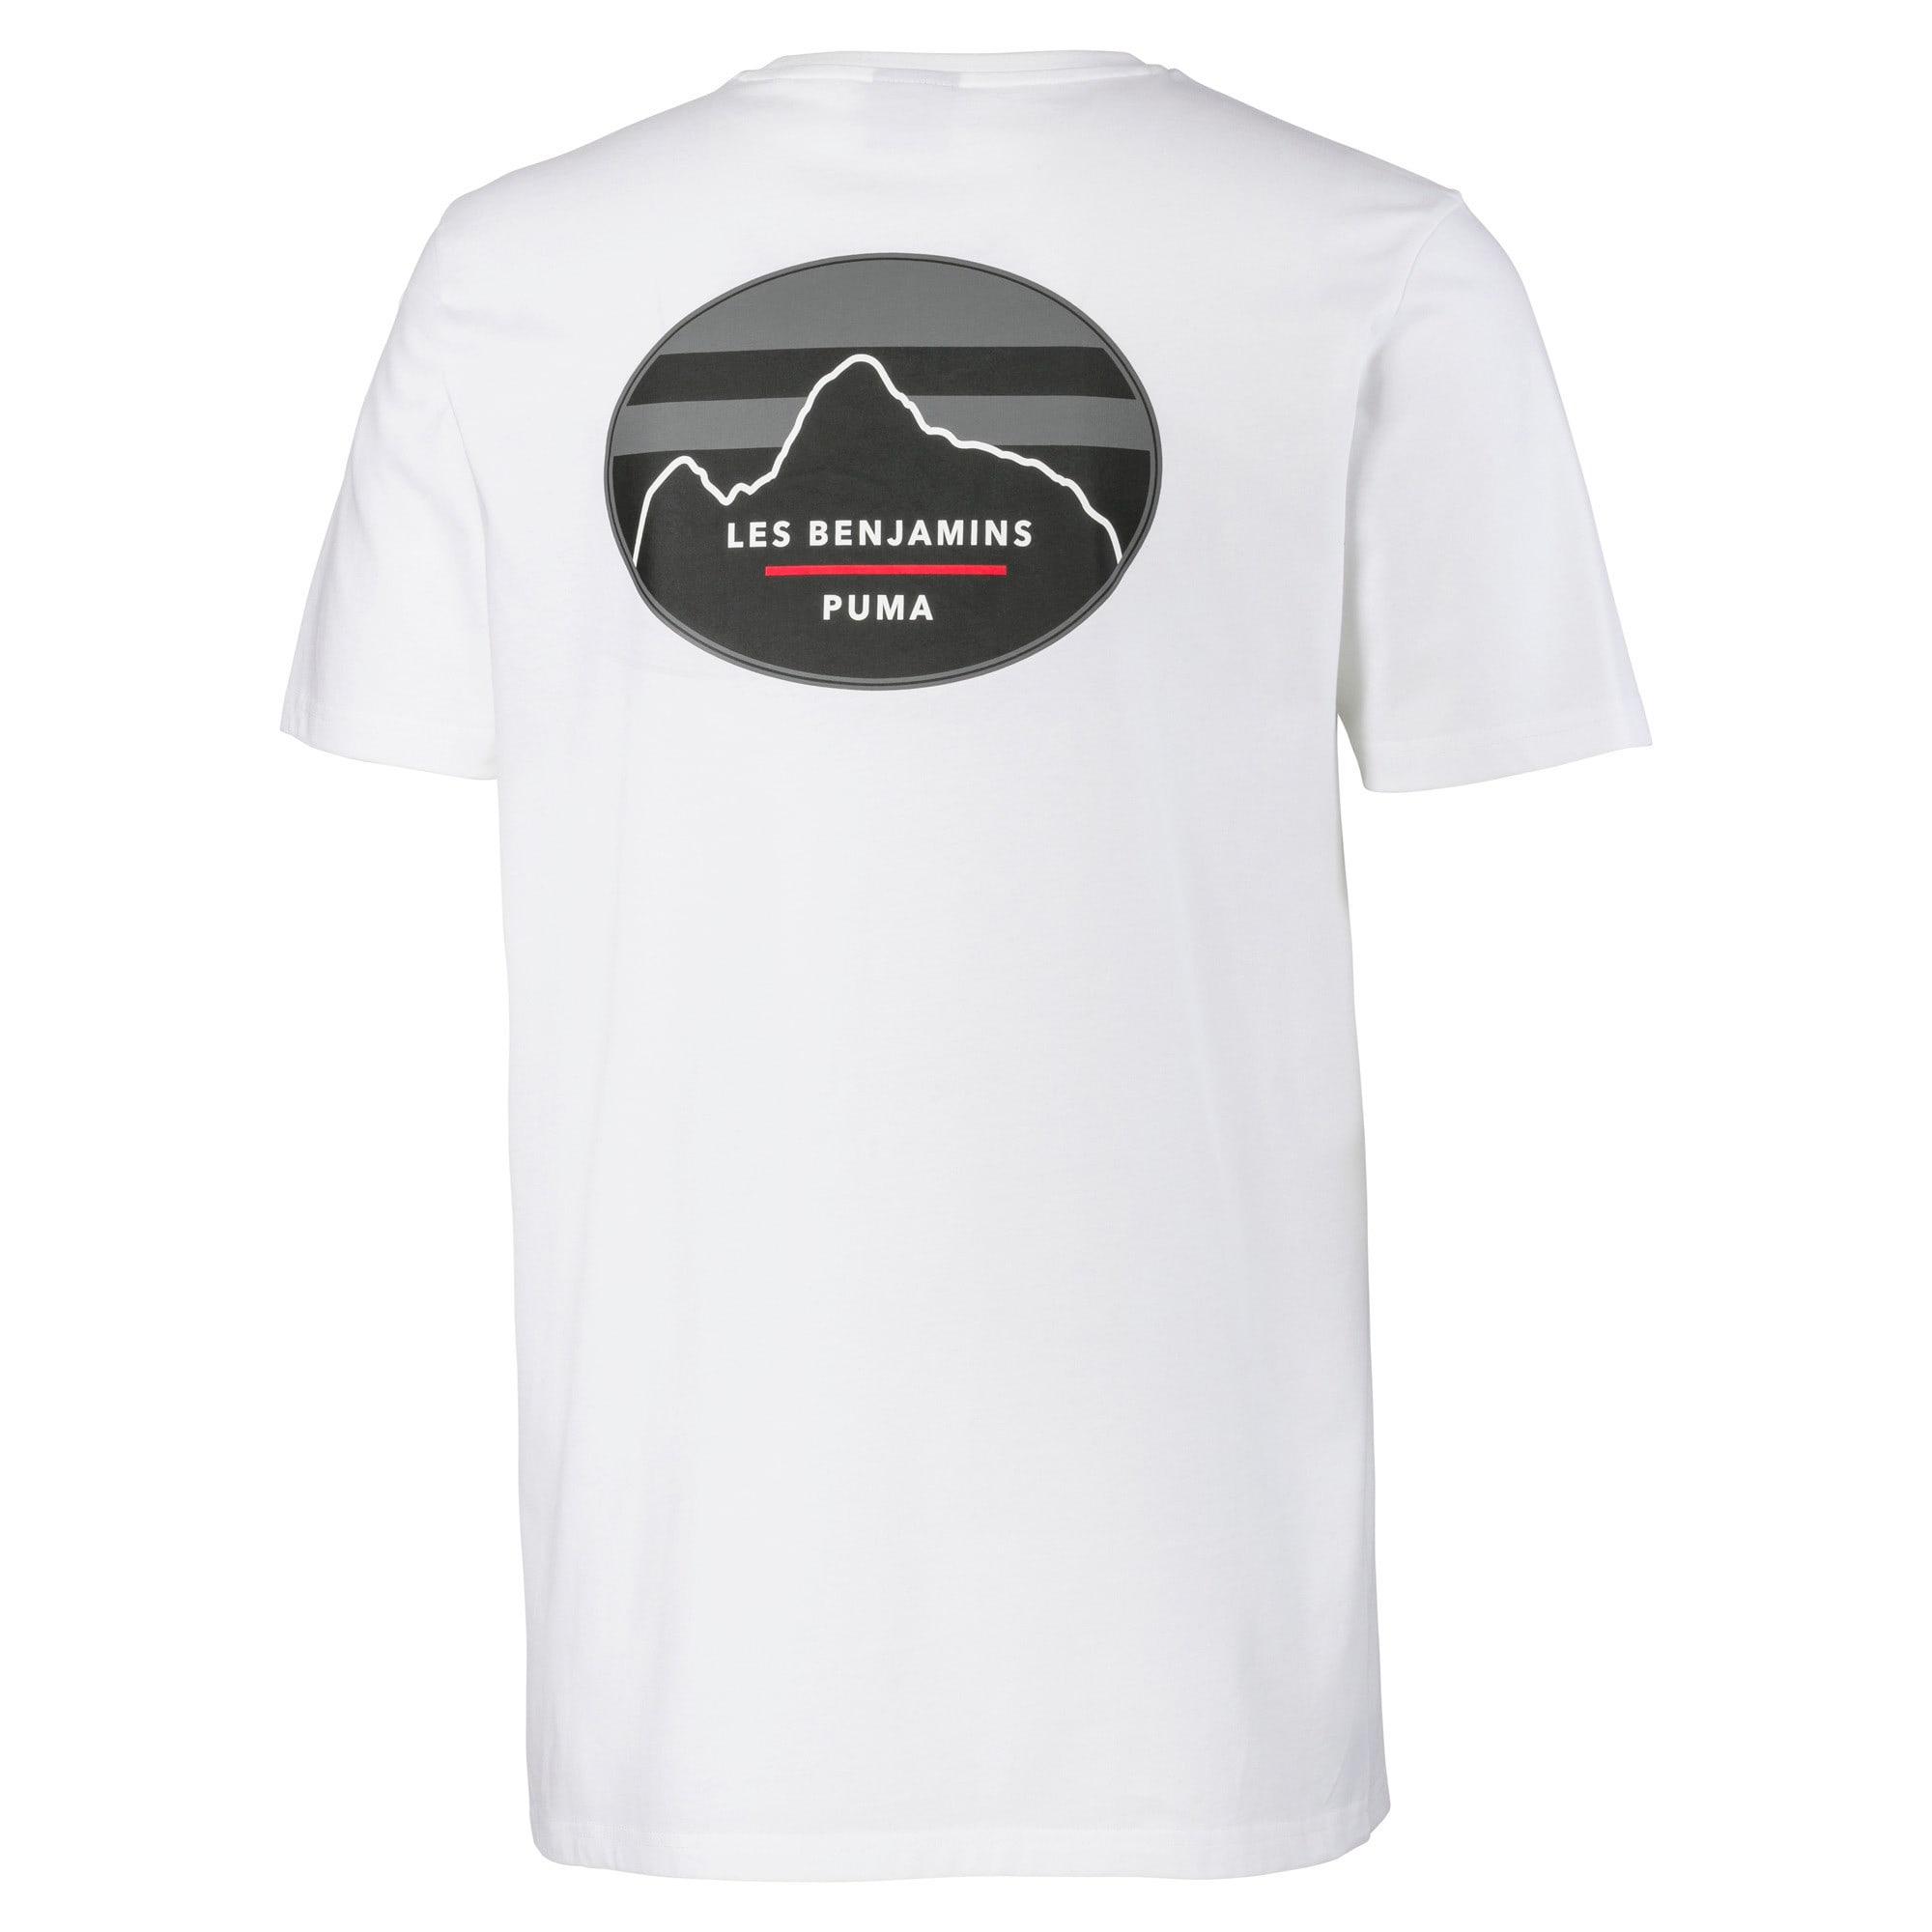 Thumbnail 6 of PUMA x LES BENJAMINS Tシャツ, Puma White, medium-JPN